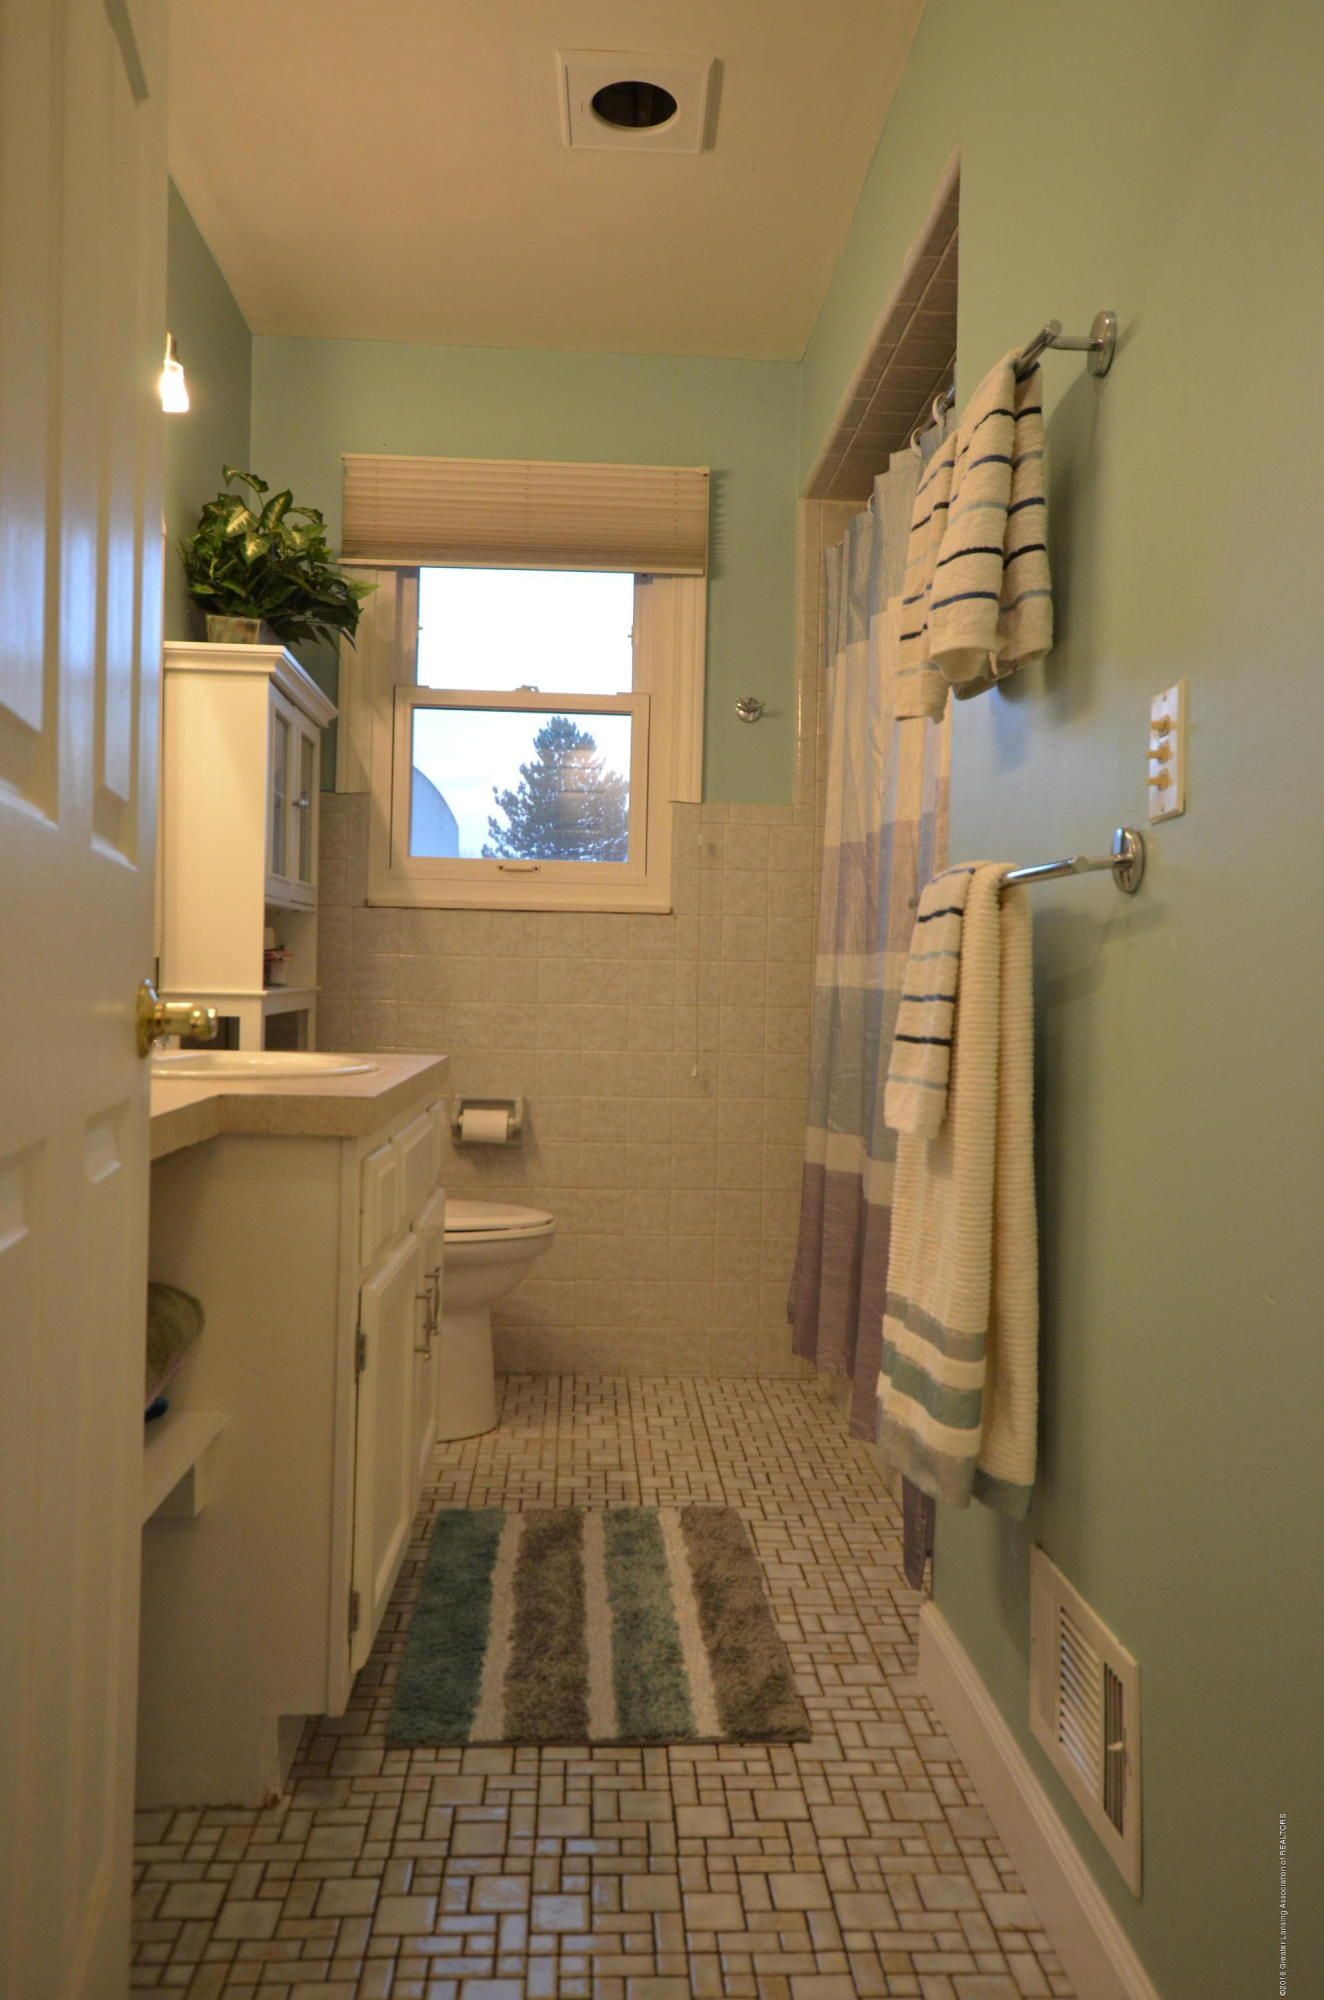 313 S Dibble Blvd - Bathroom - 5